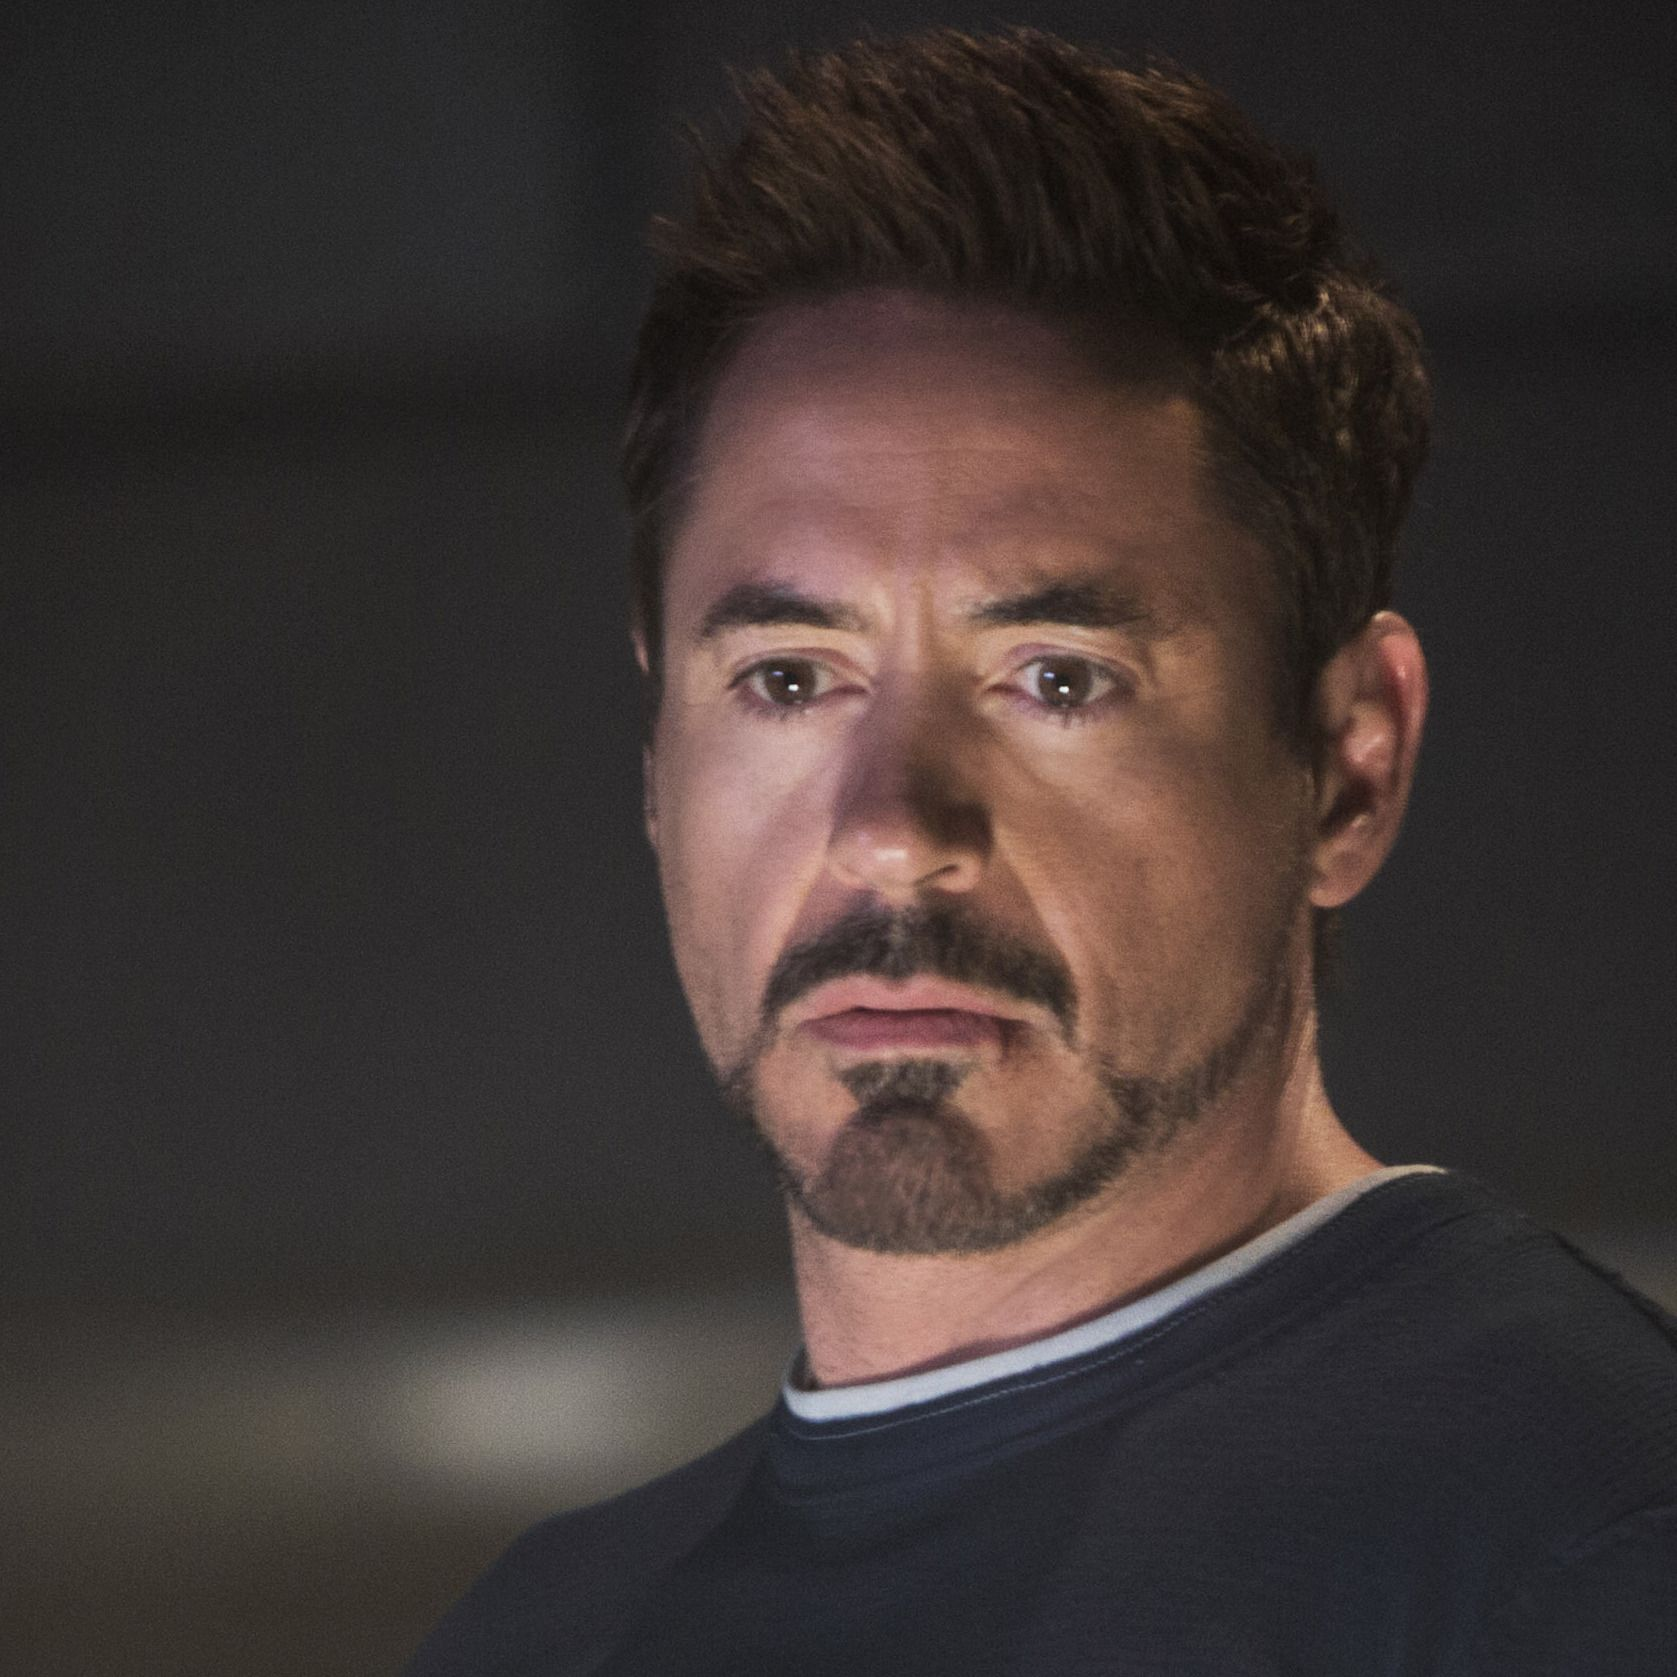 Iron Man Beard Style Downey Jr As Tony Stark In Iron Man 3